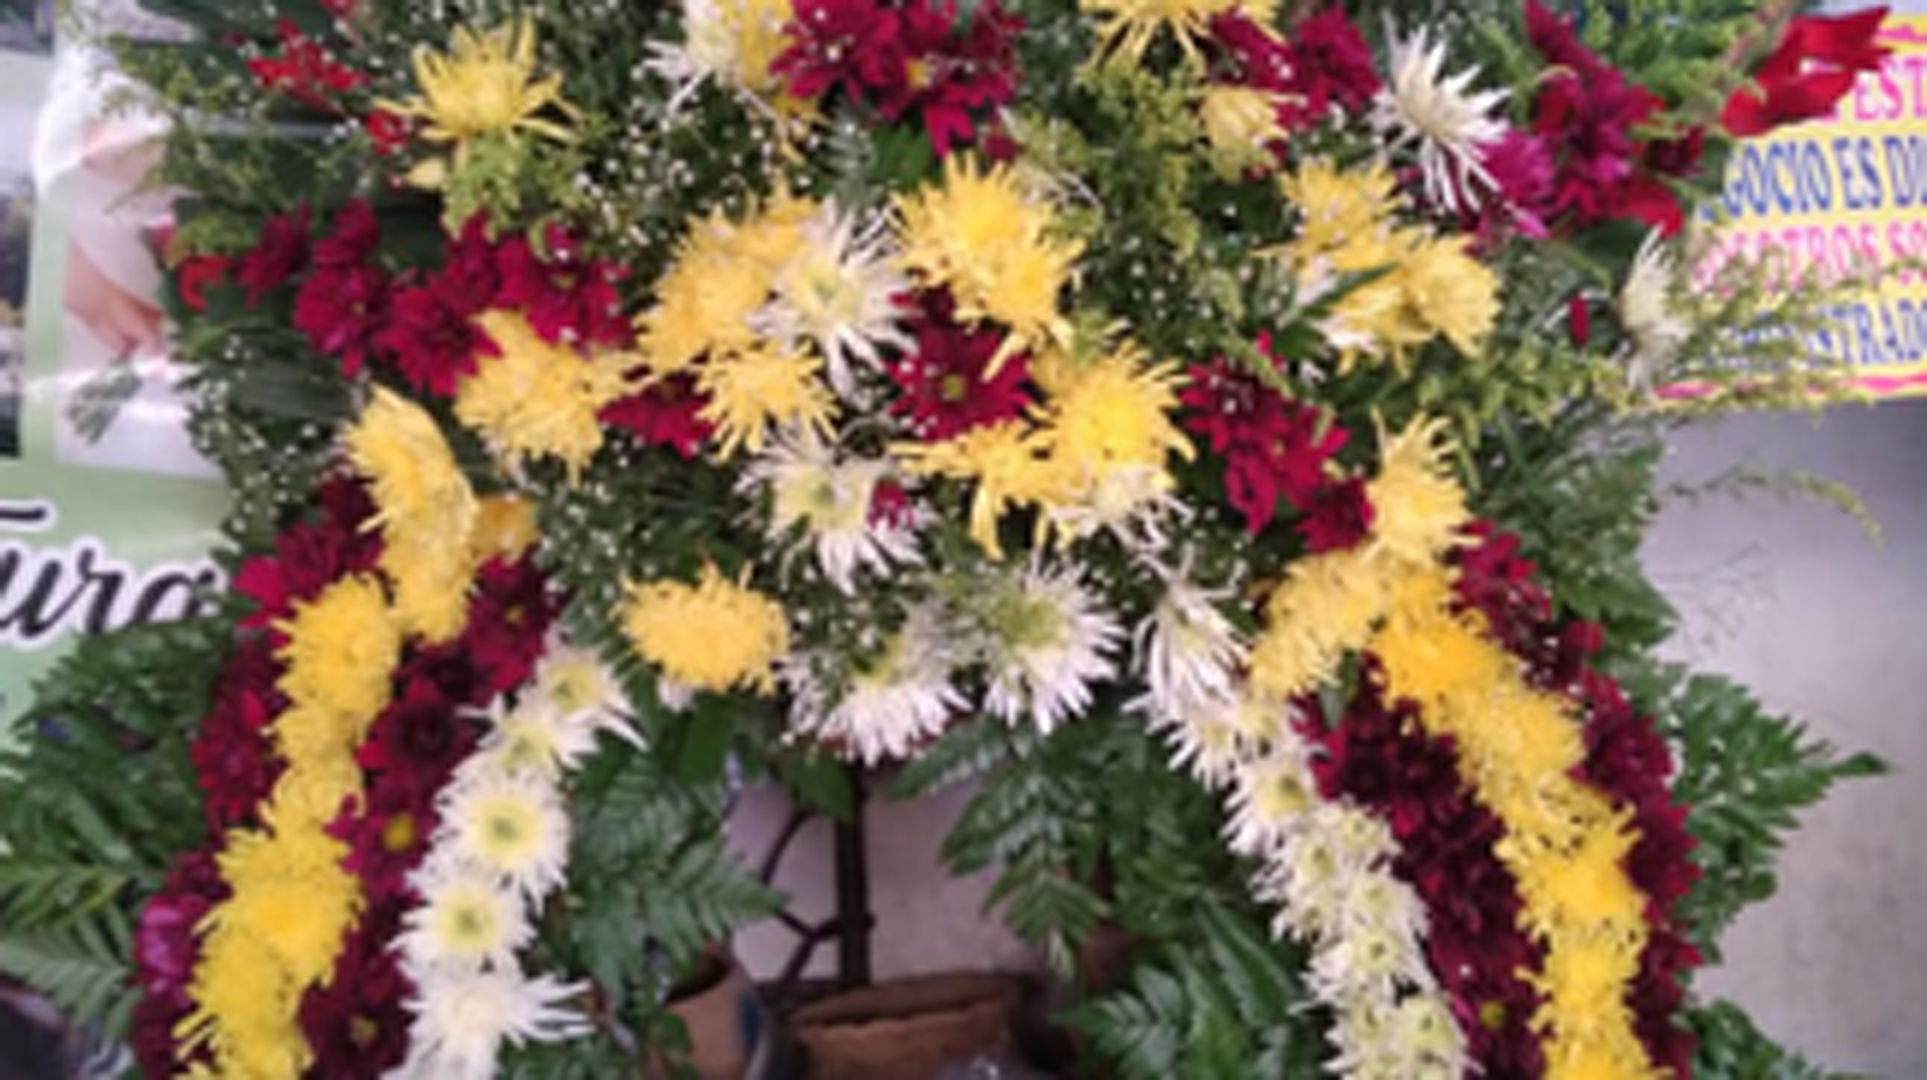 Honras Fúnebres al Jefe Edil del municipio de Teculután César Augusto Paz Castañeda.